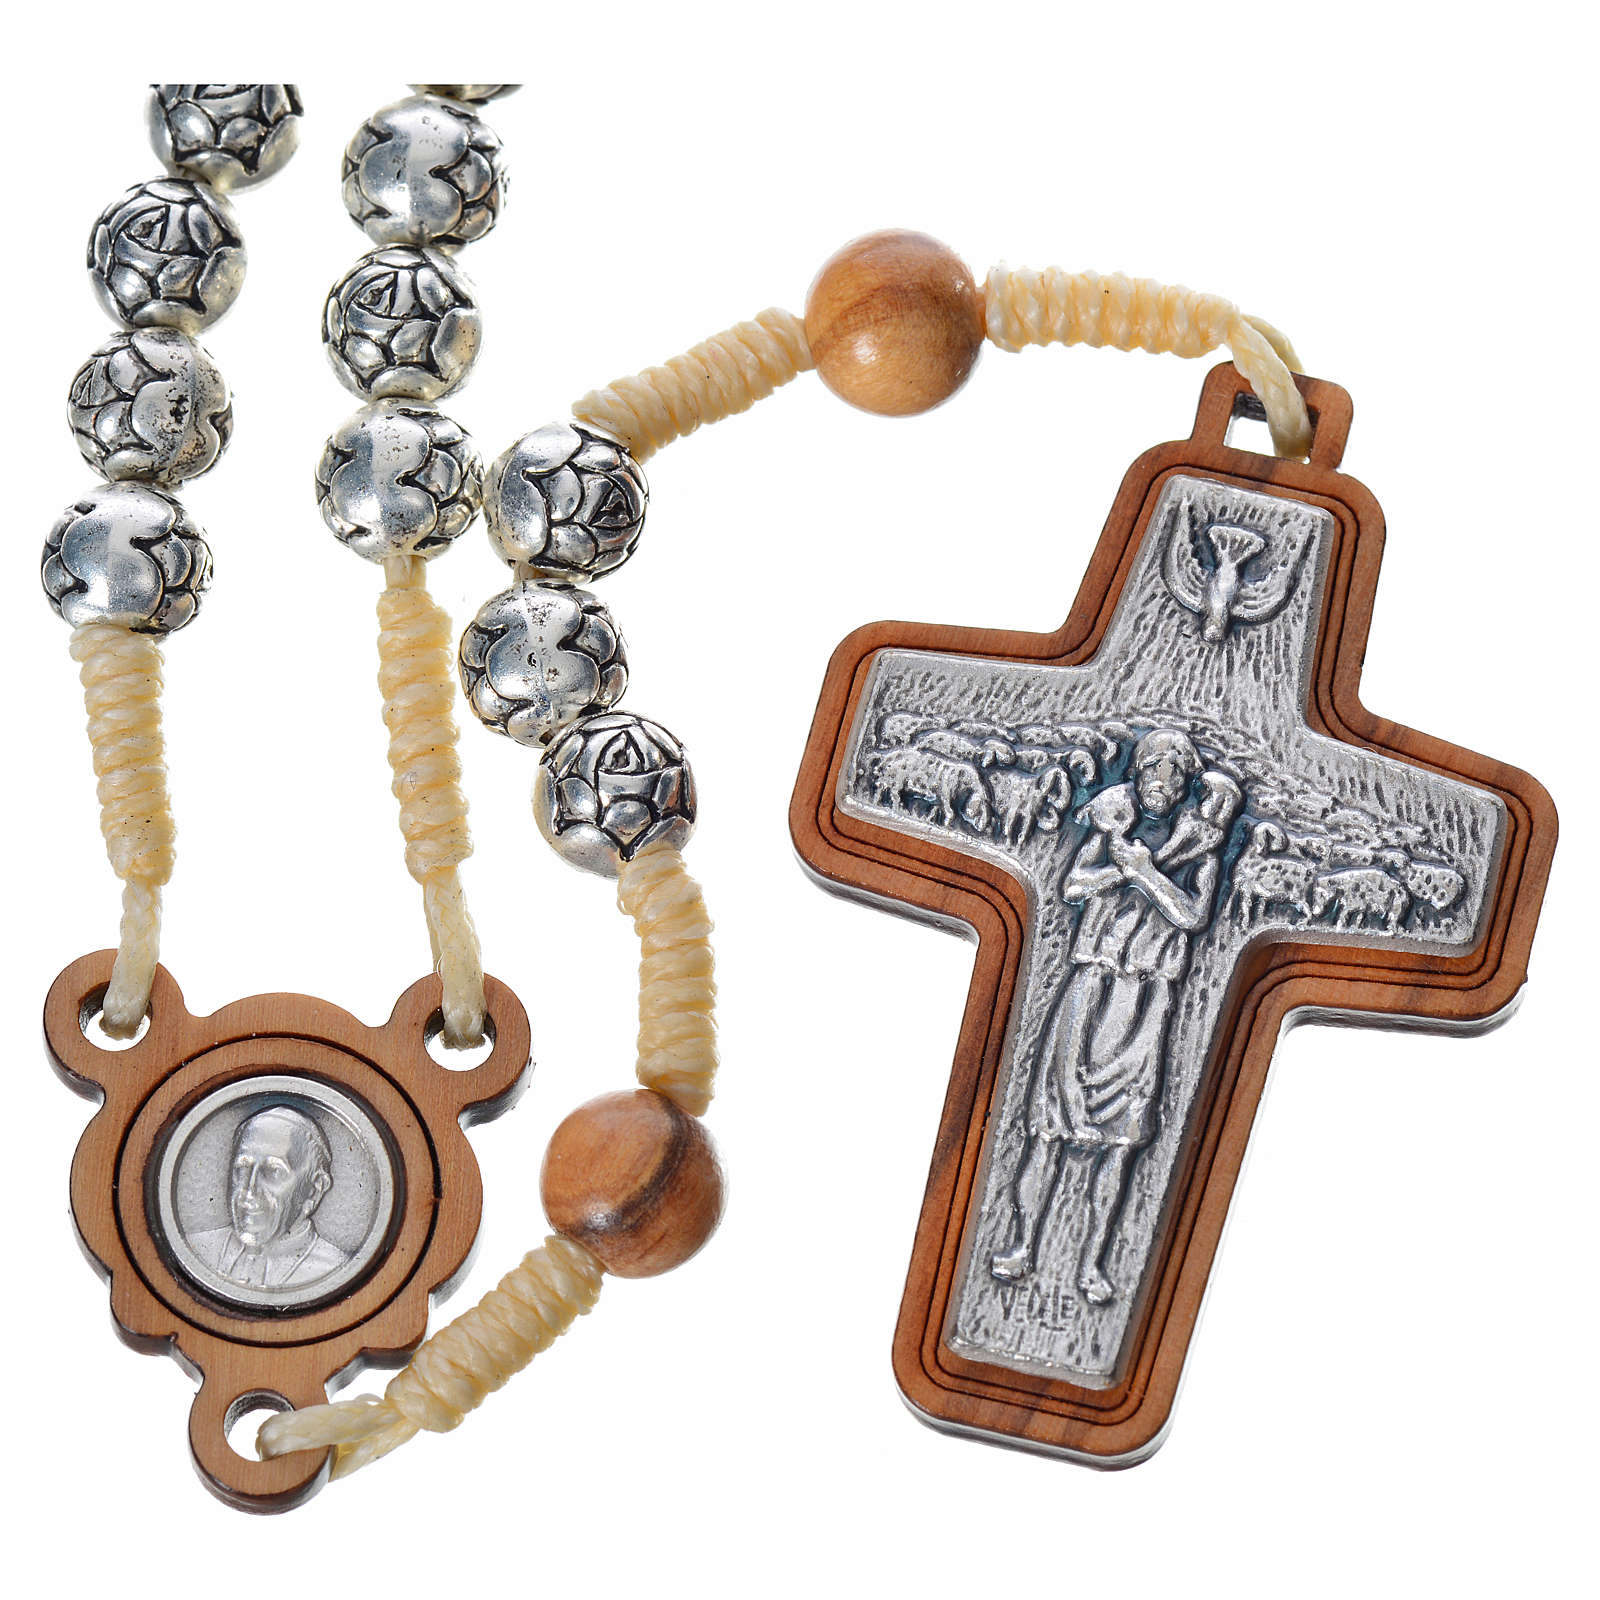 Różaniec metal drewno Papież Franciszek 4